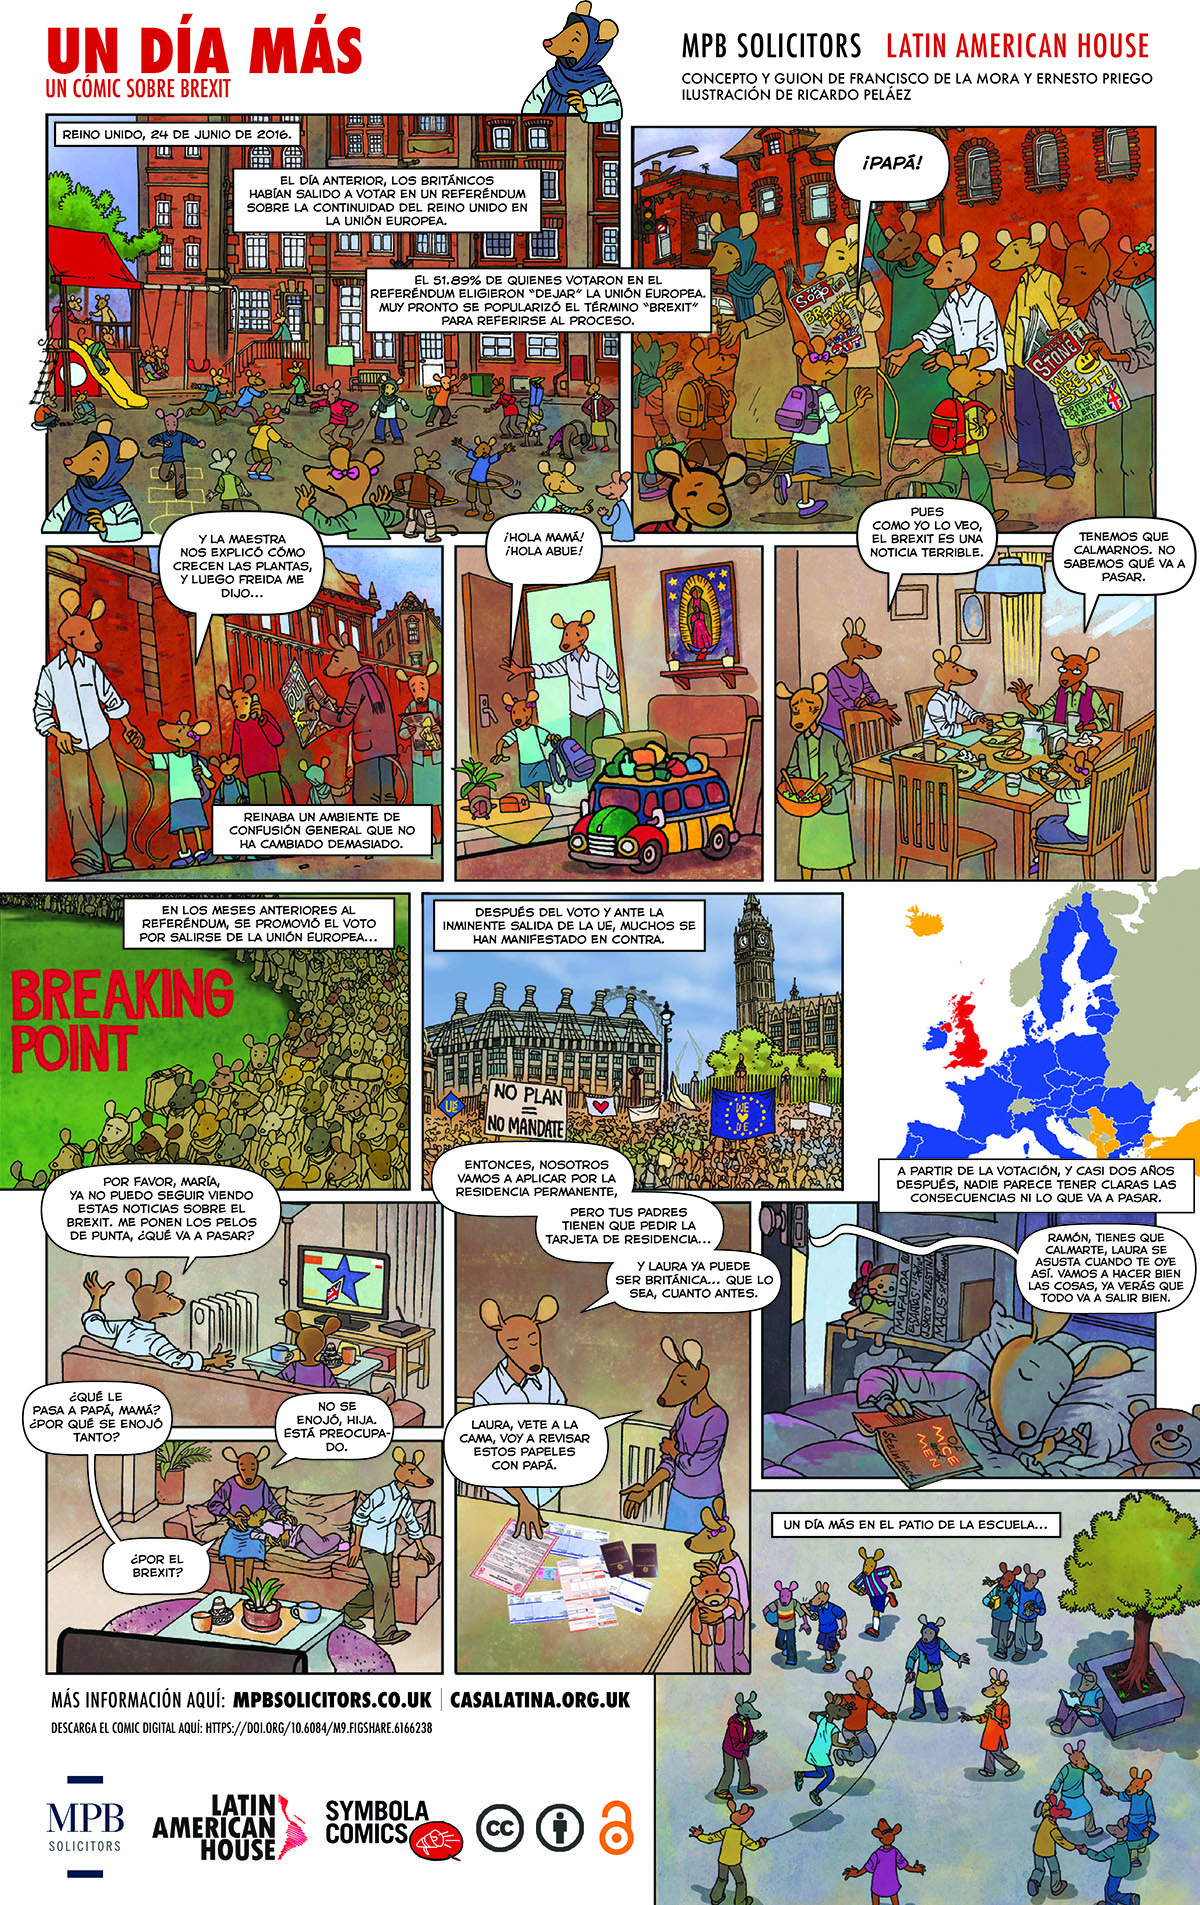 de la Mora, F., Priego, E., Peláez, R., Behar, M. P., and Rocha, D., 2018. Un día más: un cómic sobre Brexit. Available from: https://doi.org/10.6084/m9.figshare.6166238